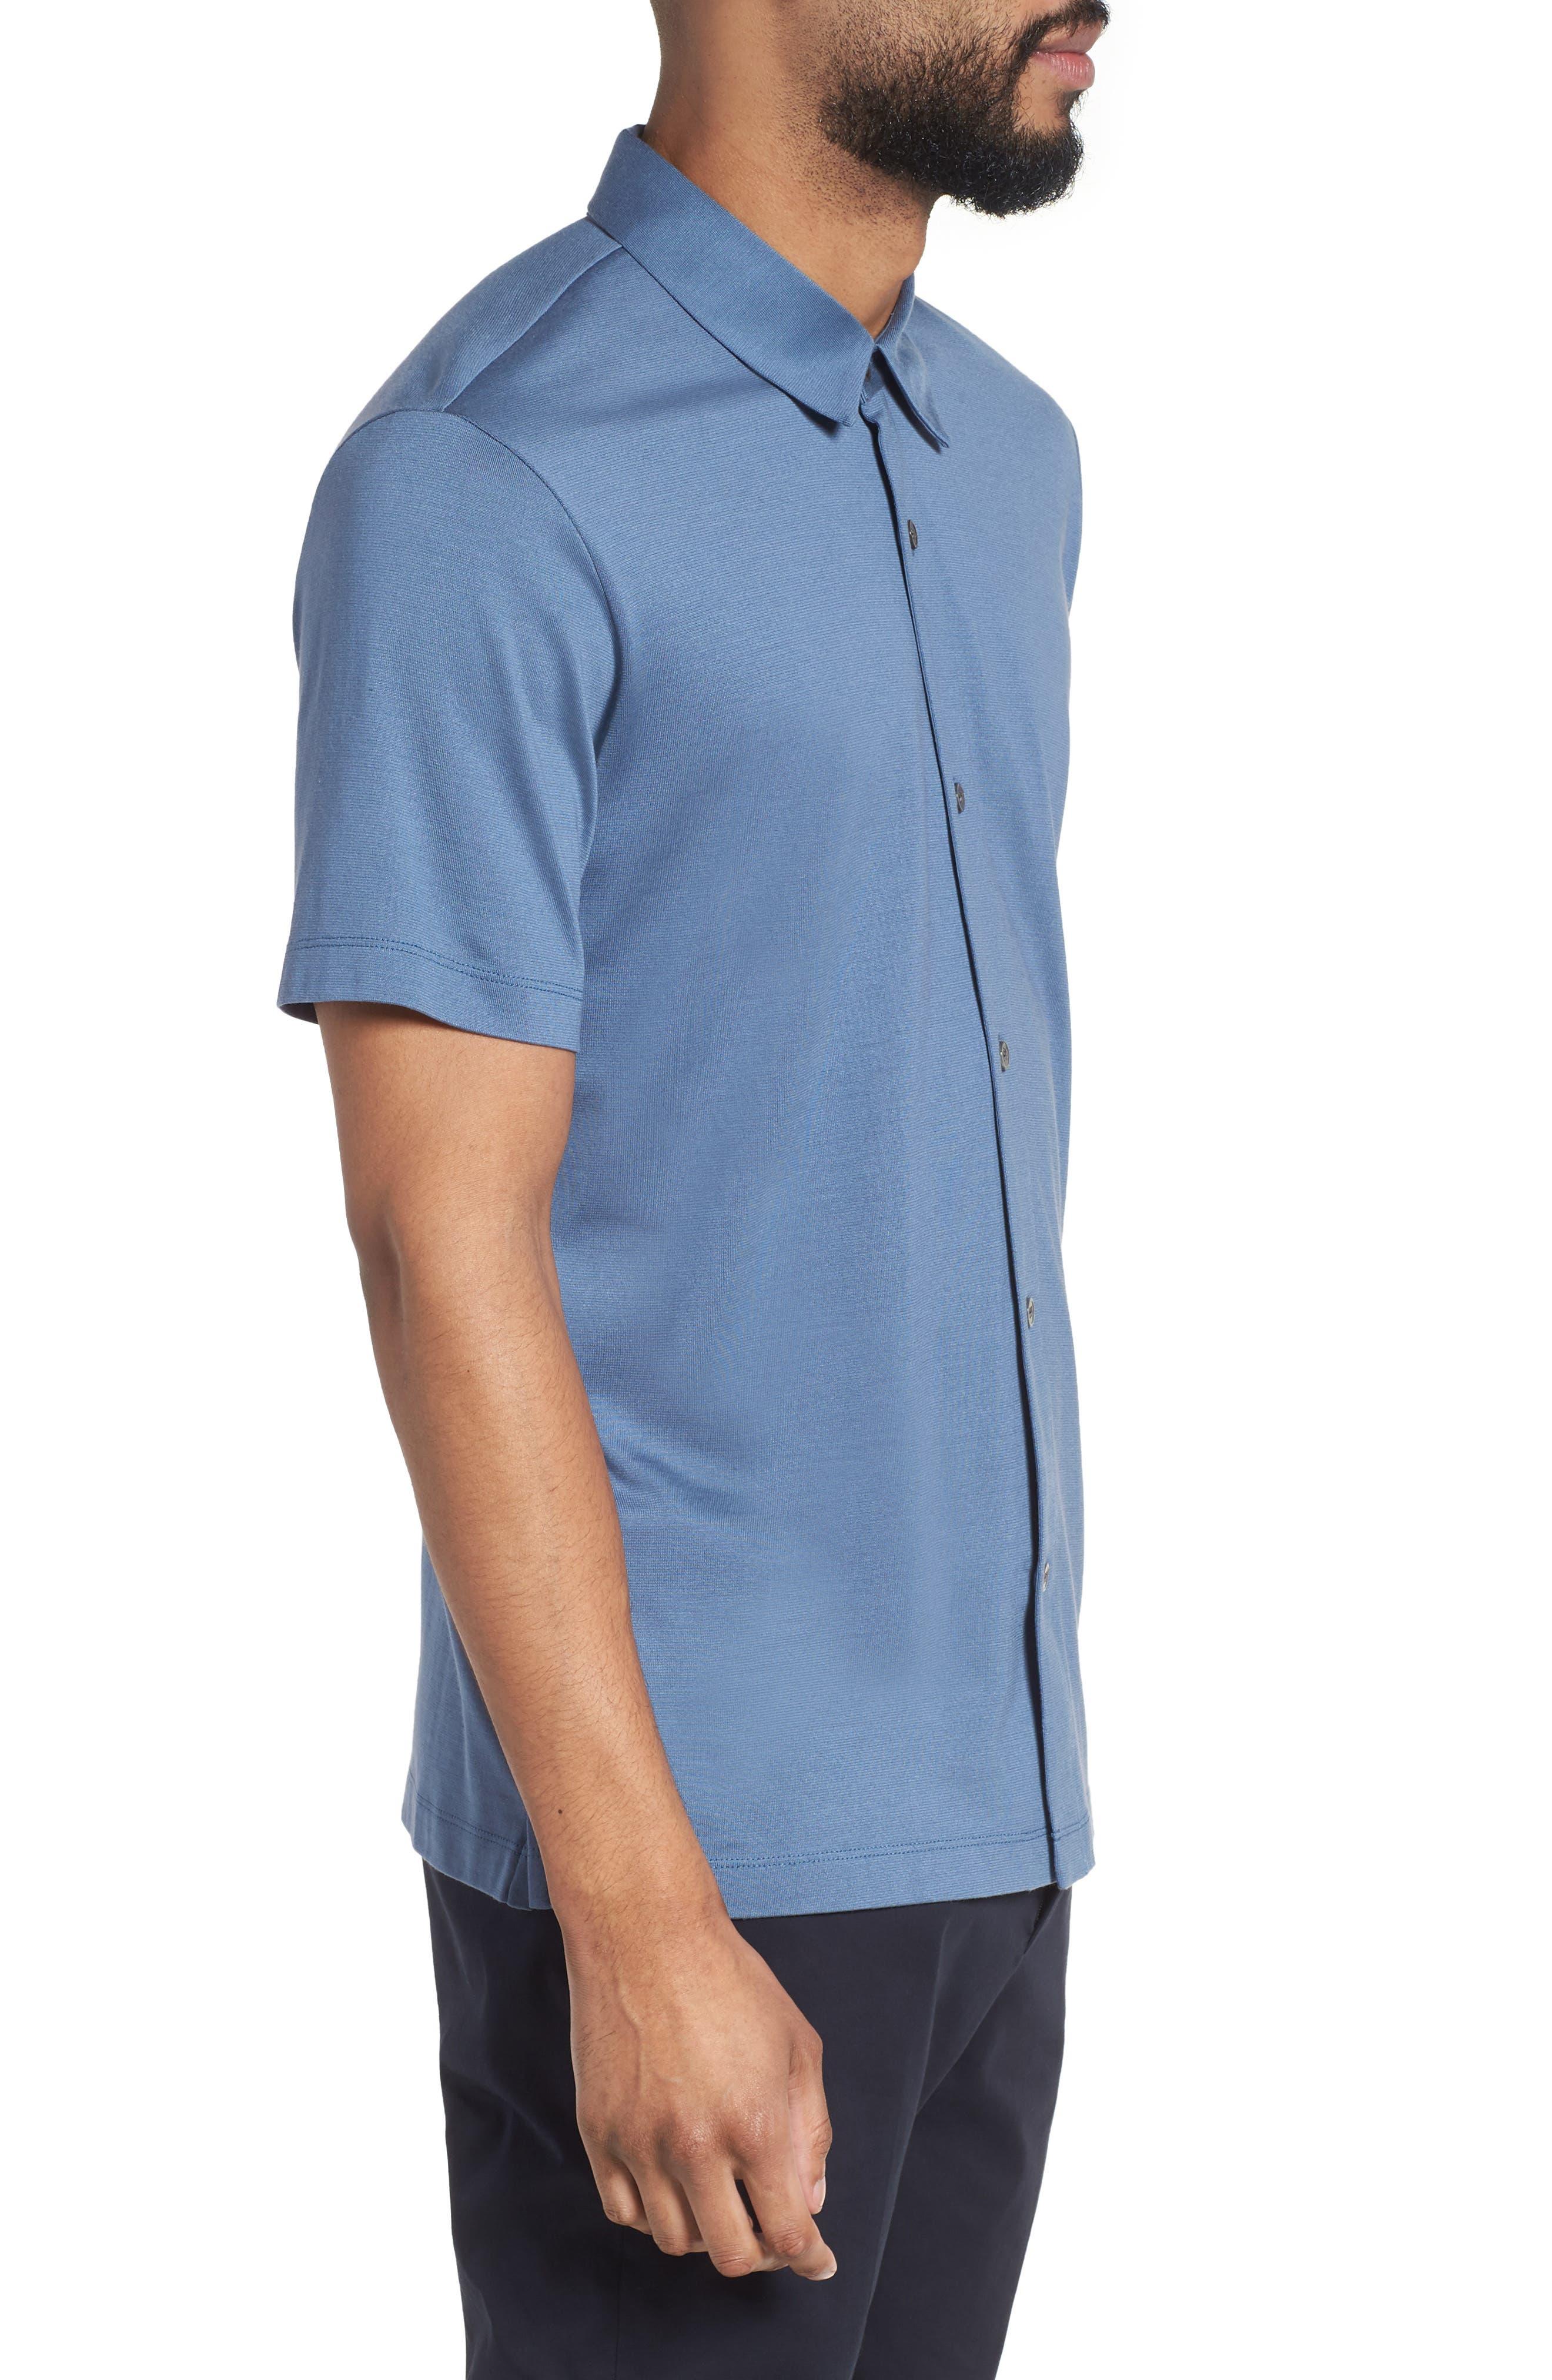 Incisive Silk & Cotton Short Sleeve Sport Shirt,                             Alternate thumbnail 3, color,                             Iris